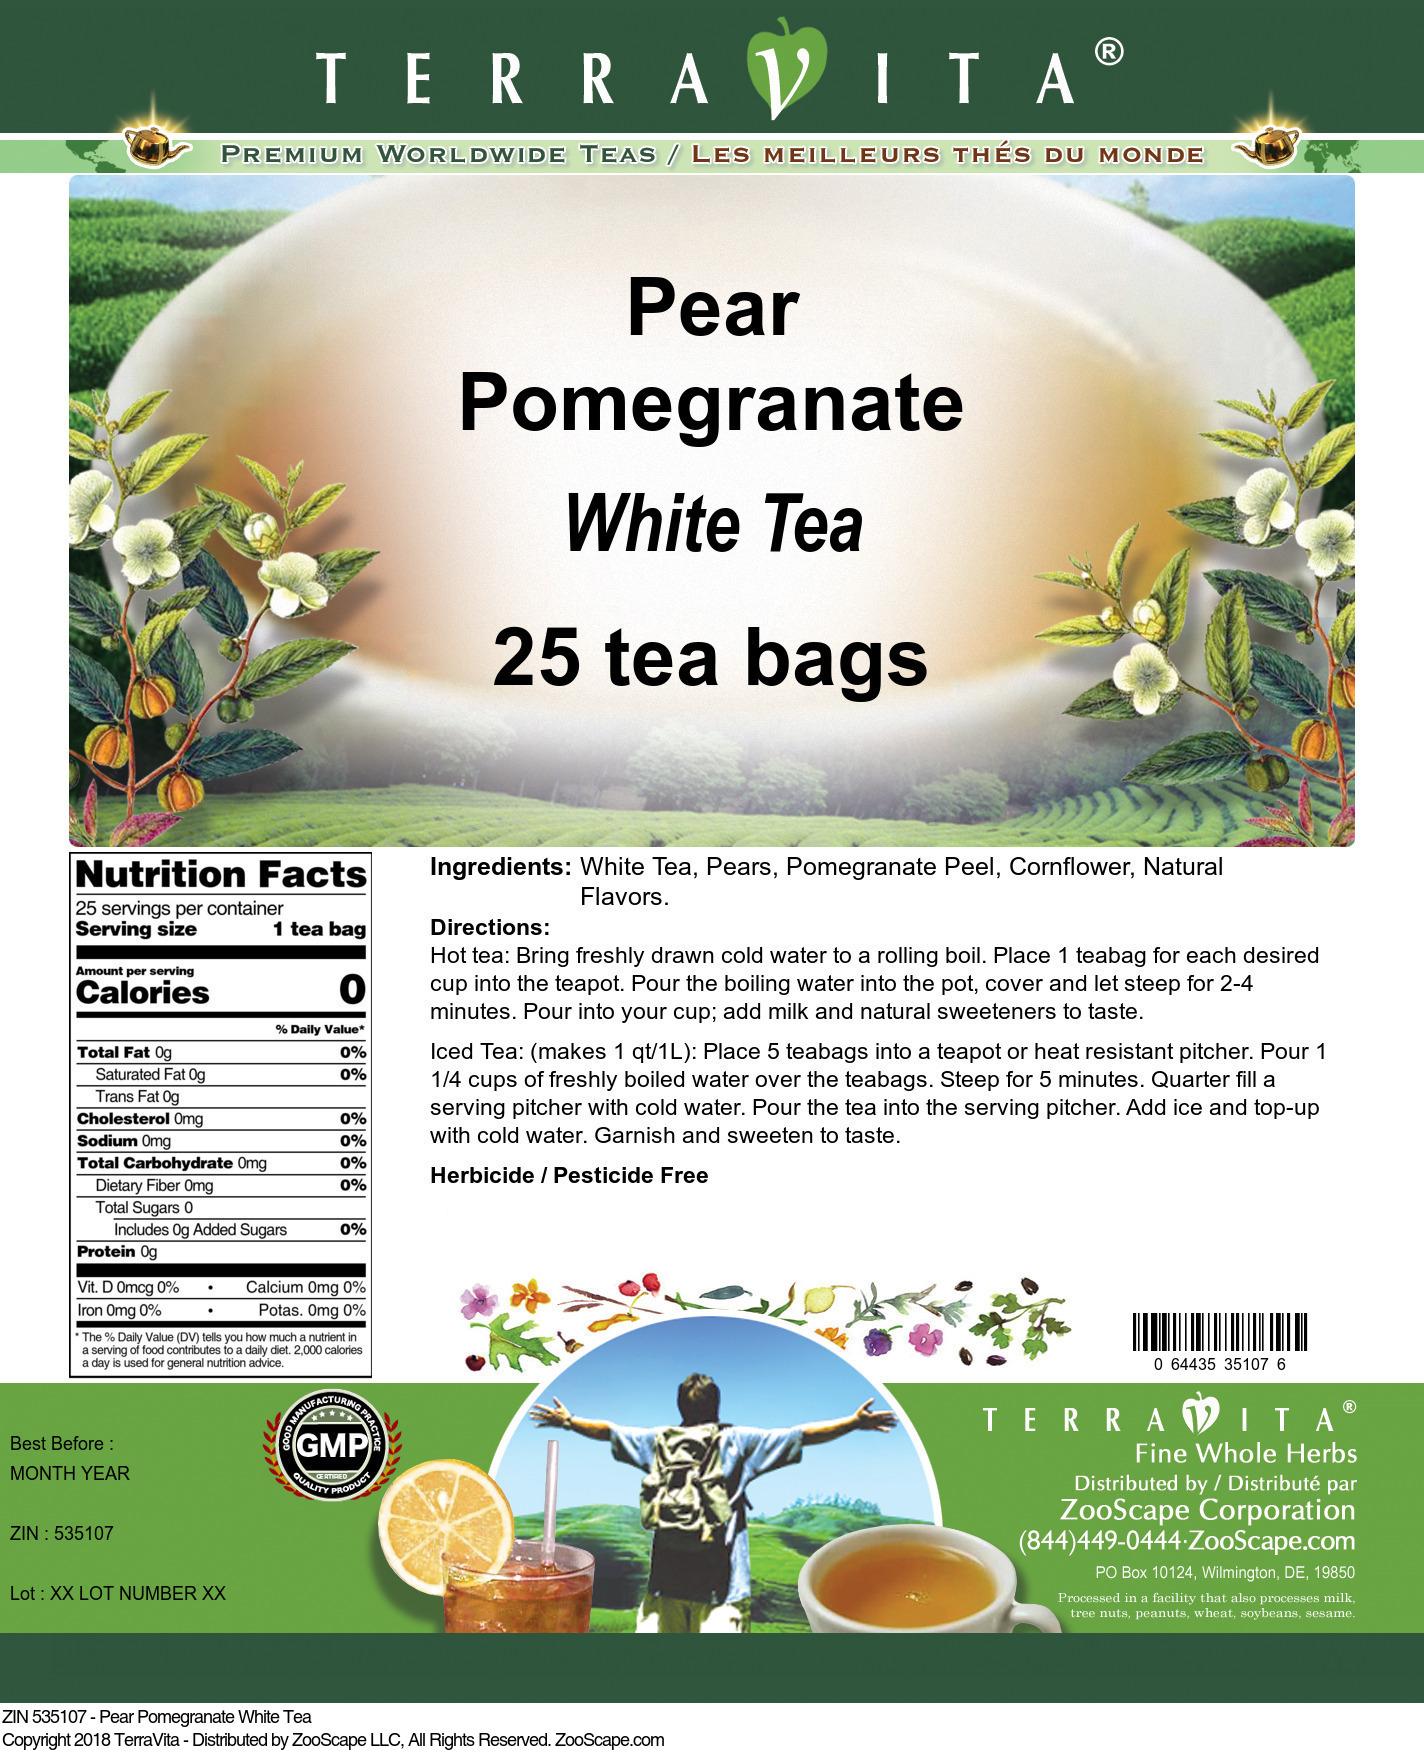 Pear Pomegranate White Tea